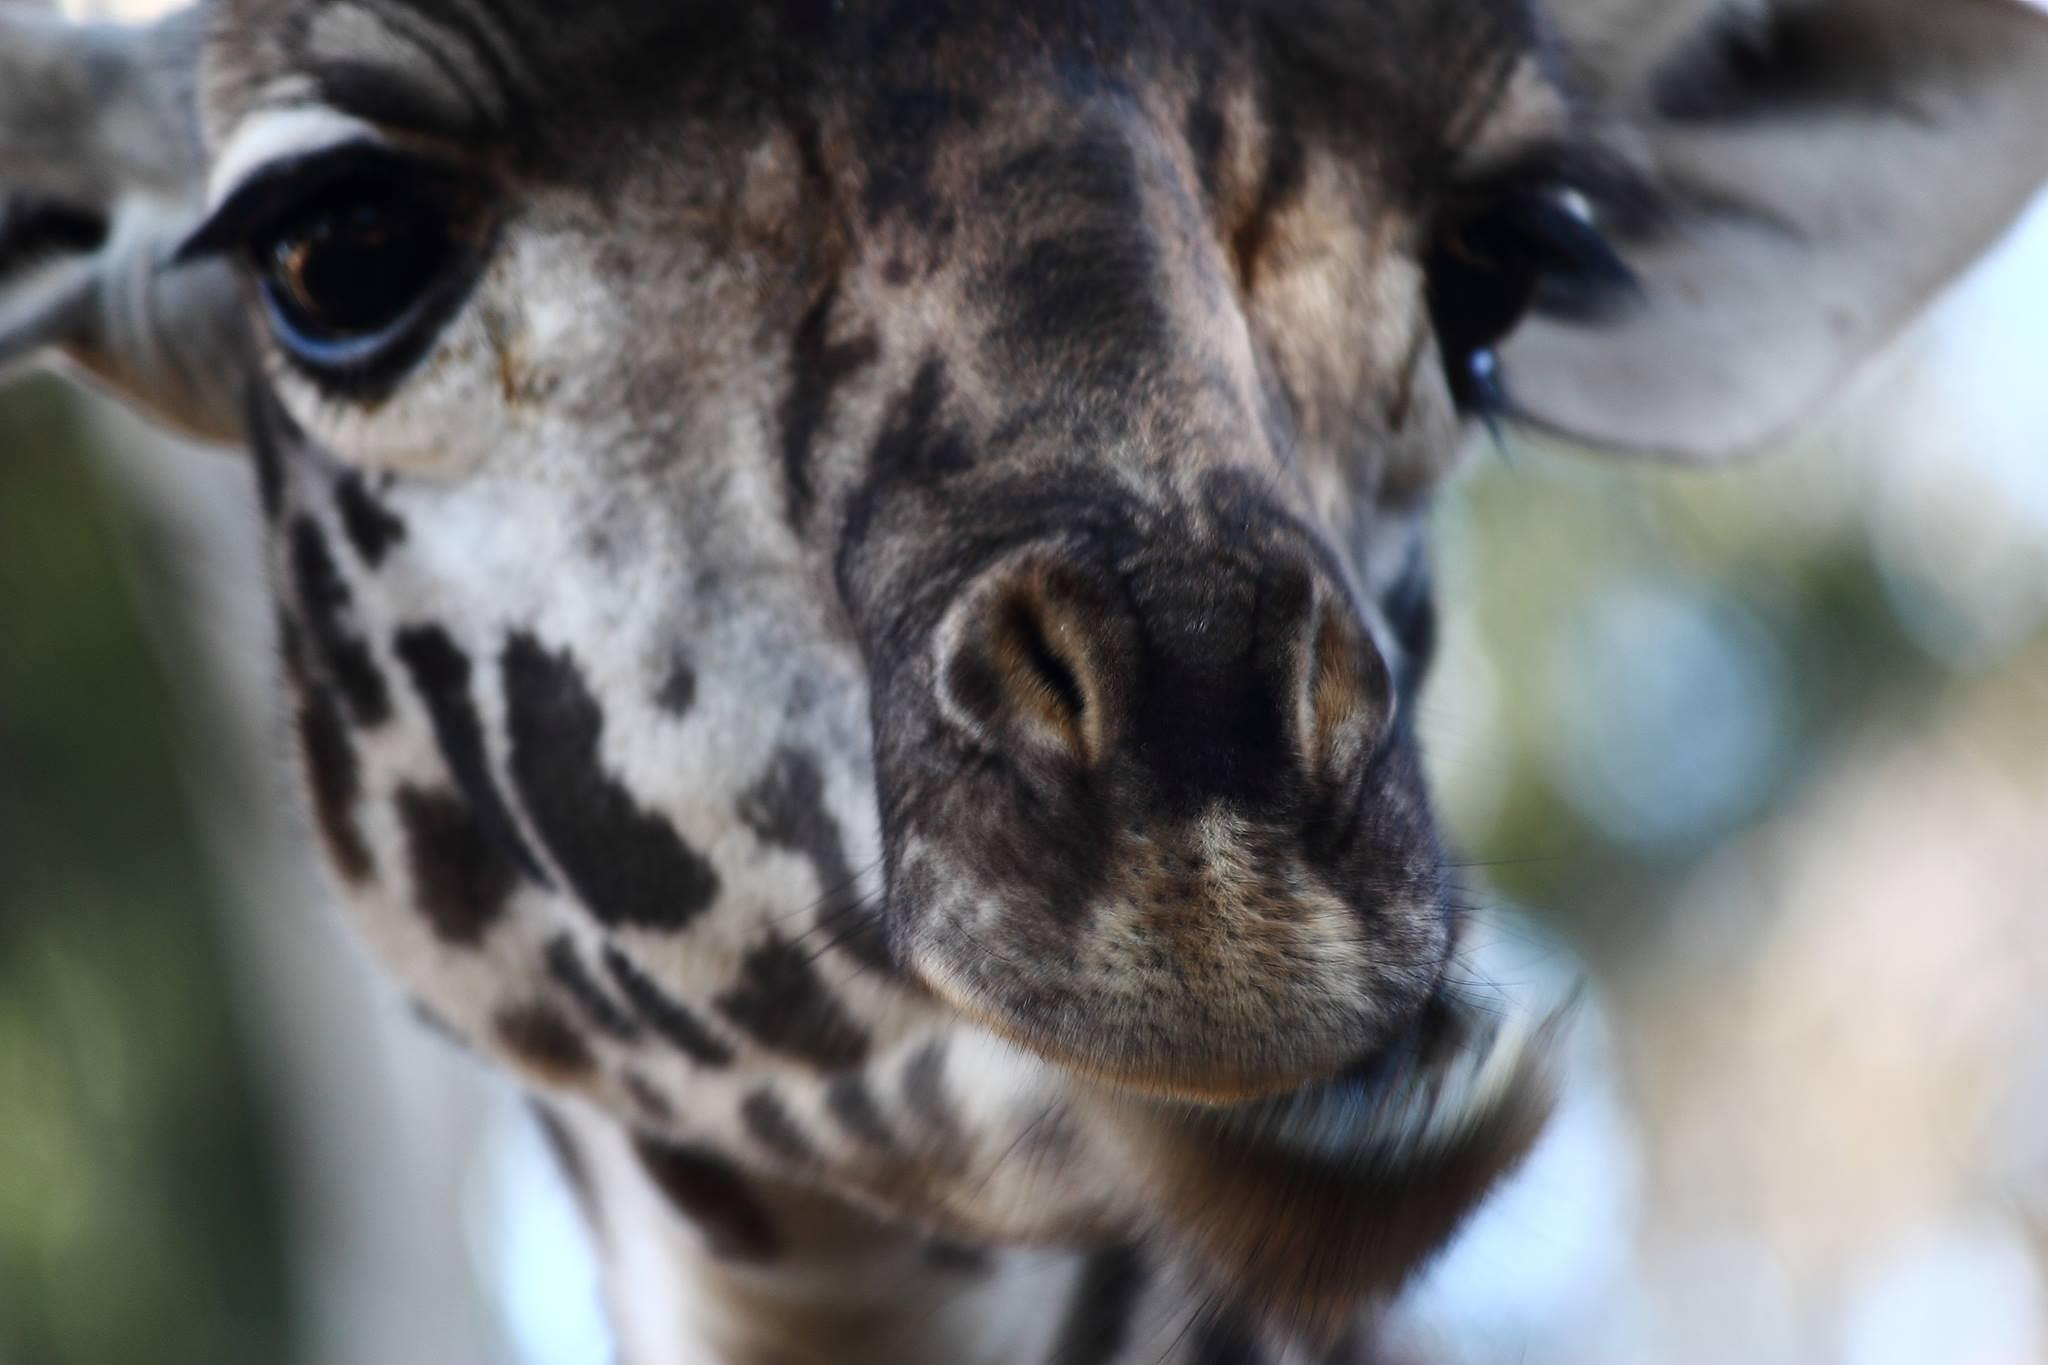 Giraffe by kat.larsen1